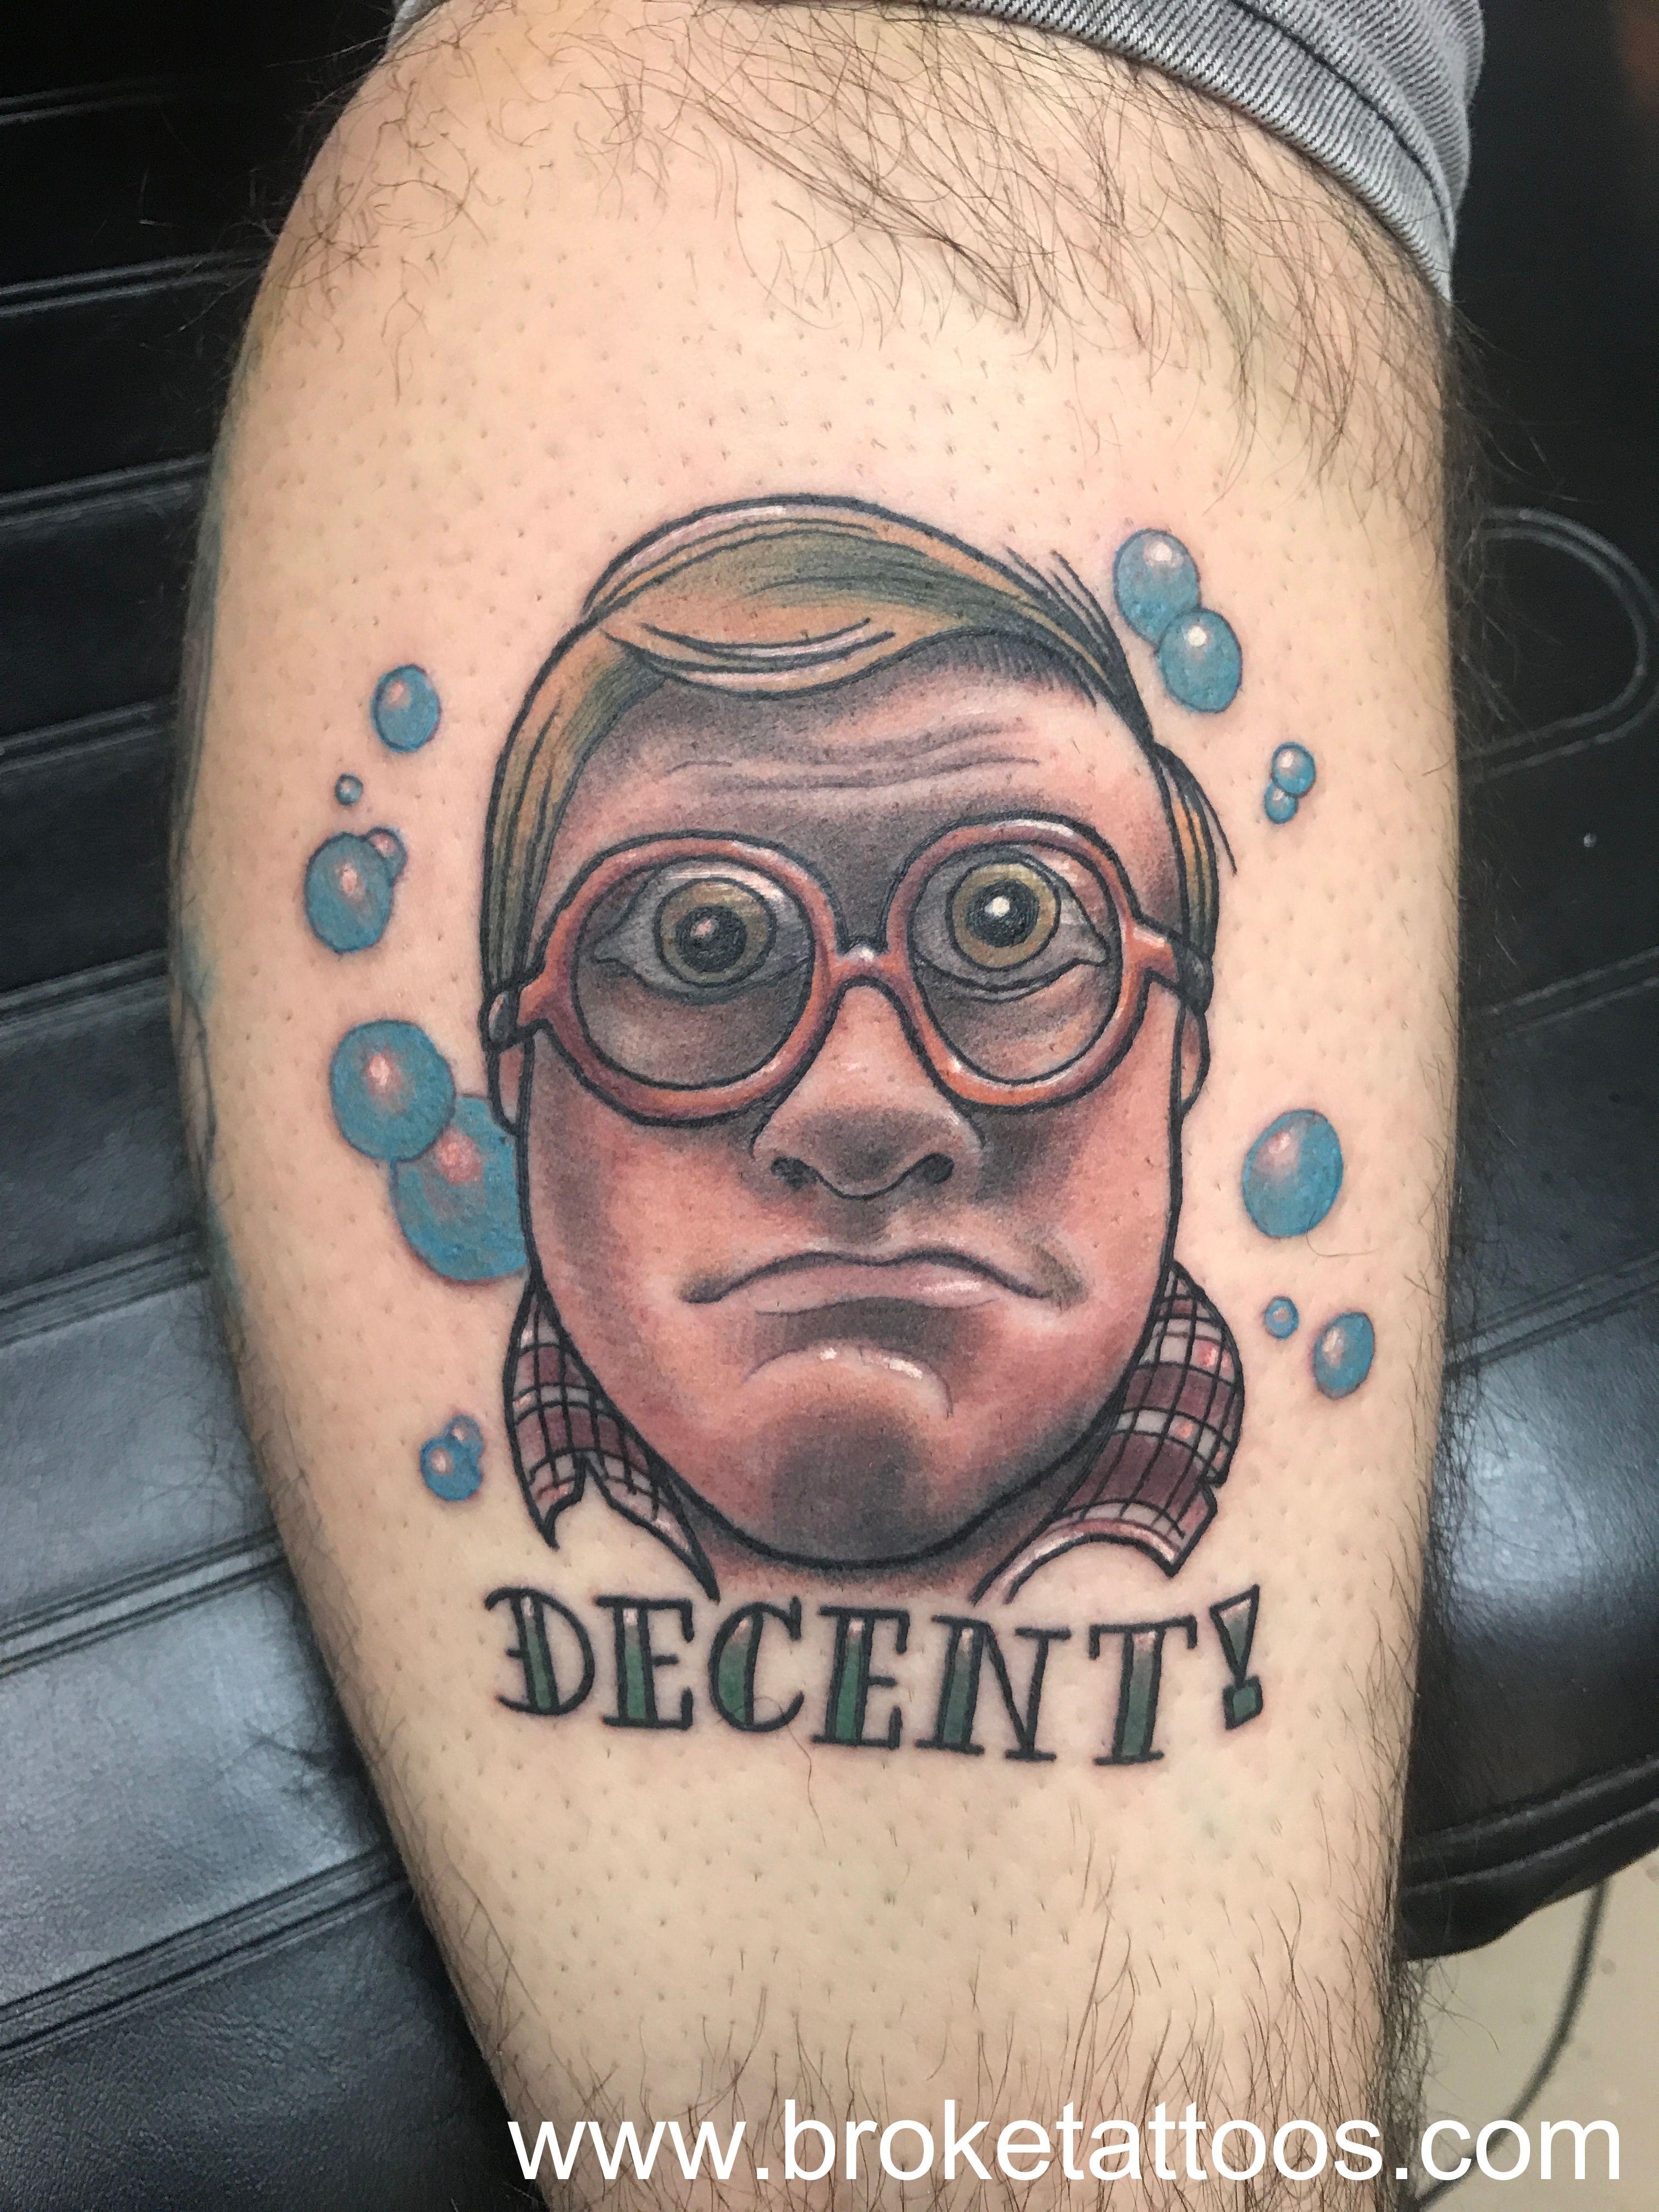 broketattoos viciousinksh ink tattoos michigantattooer bubbles trailerparkboys decent kitties